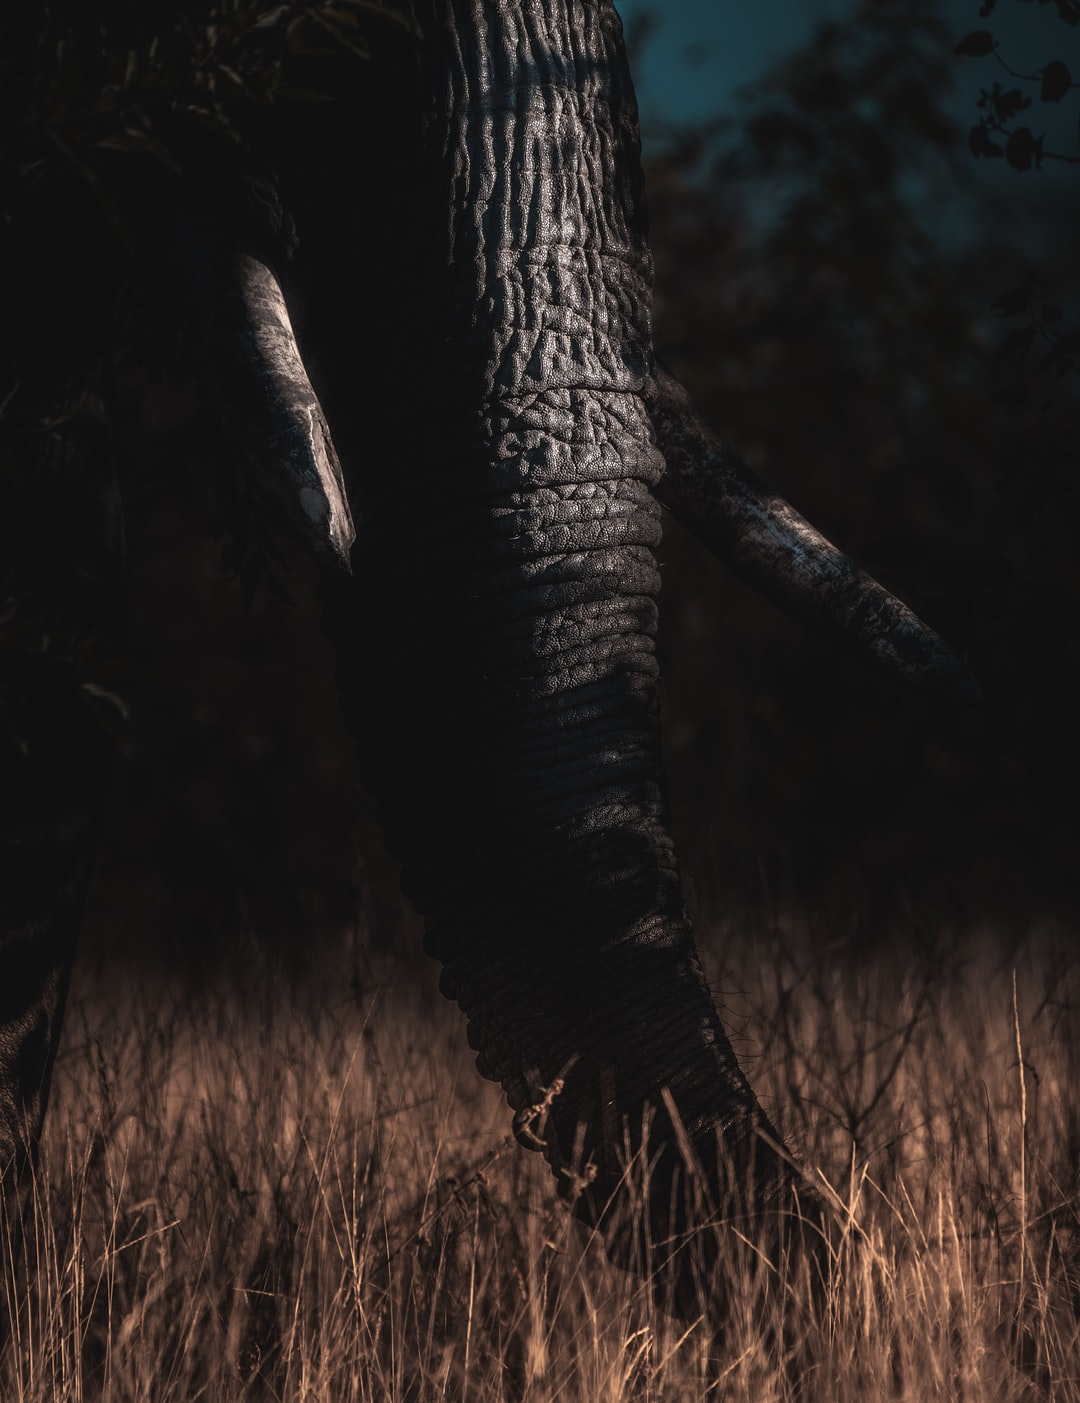 Elephant grazing at sunset